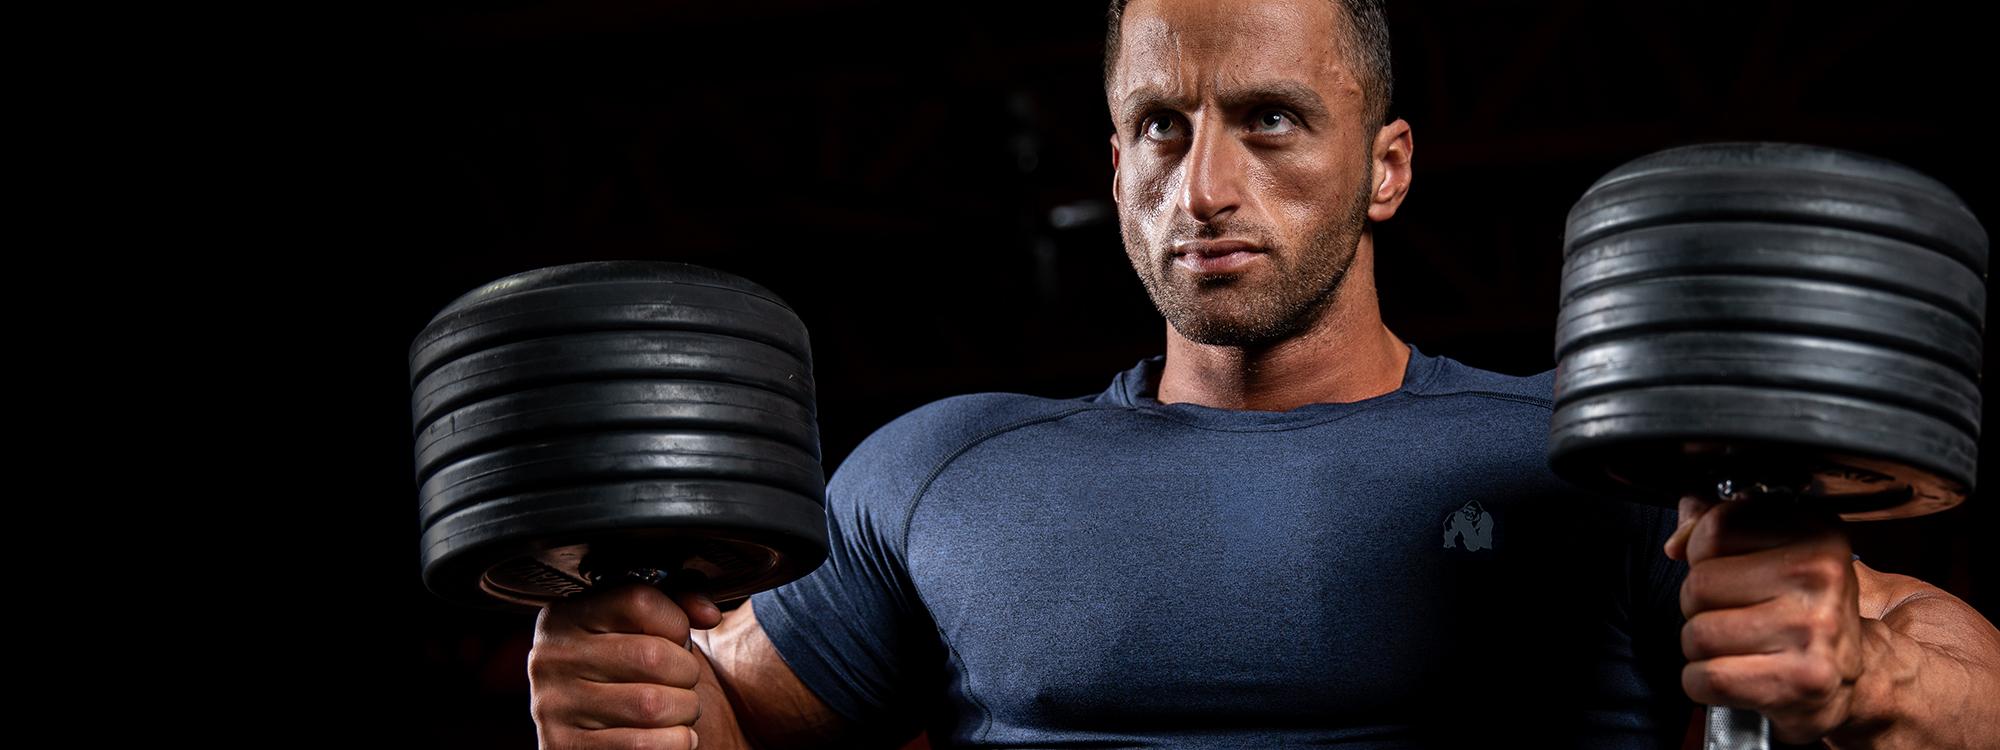 Bodybuilding dating site gratis DotA 2 matchmaking havens